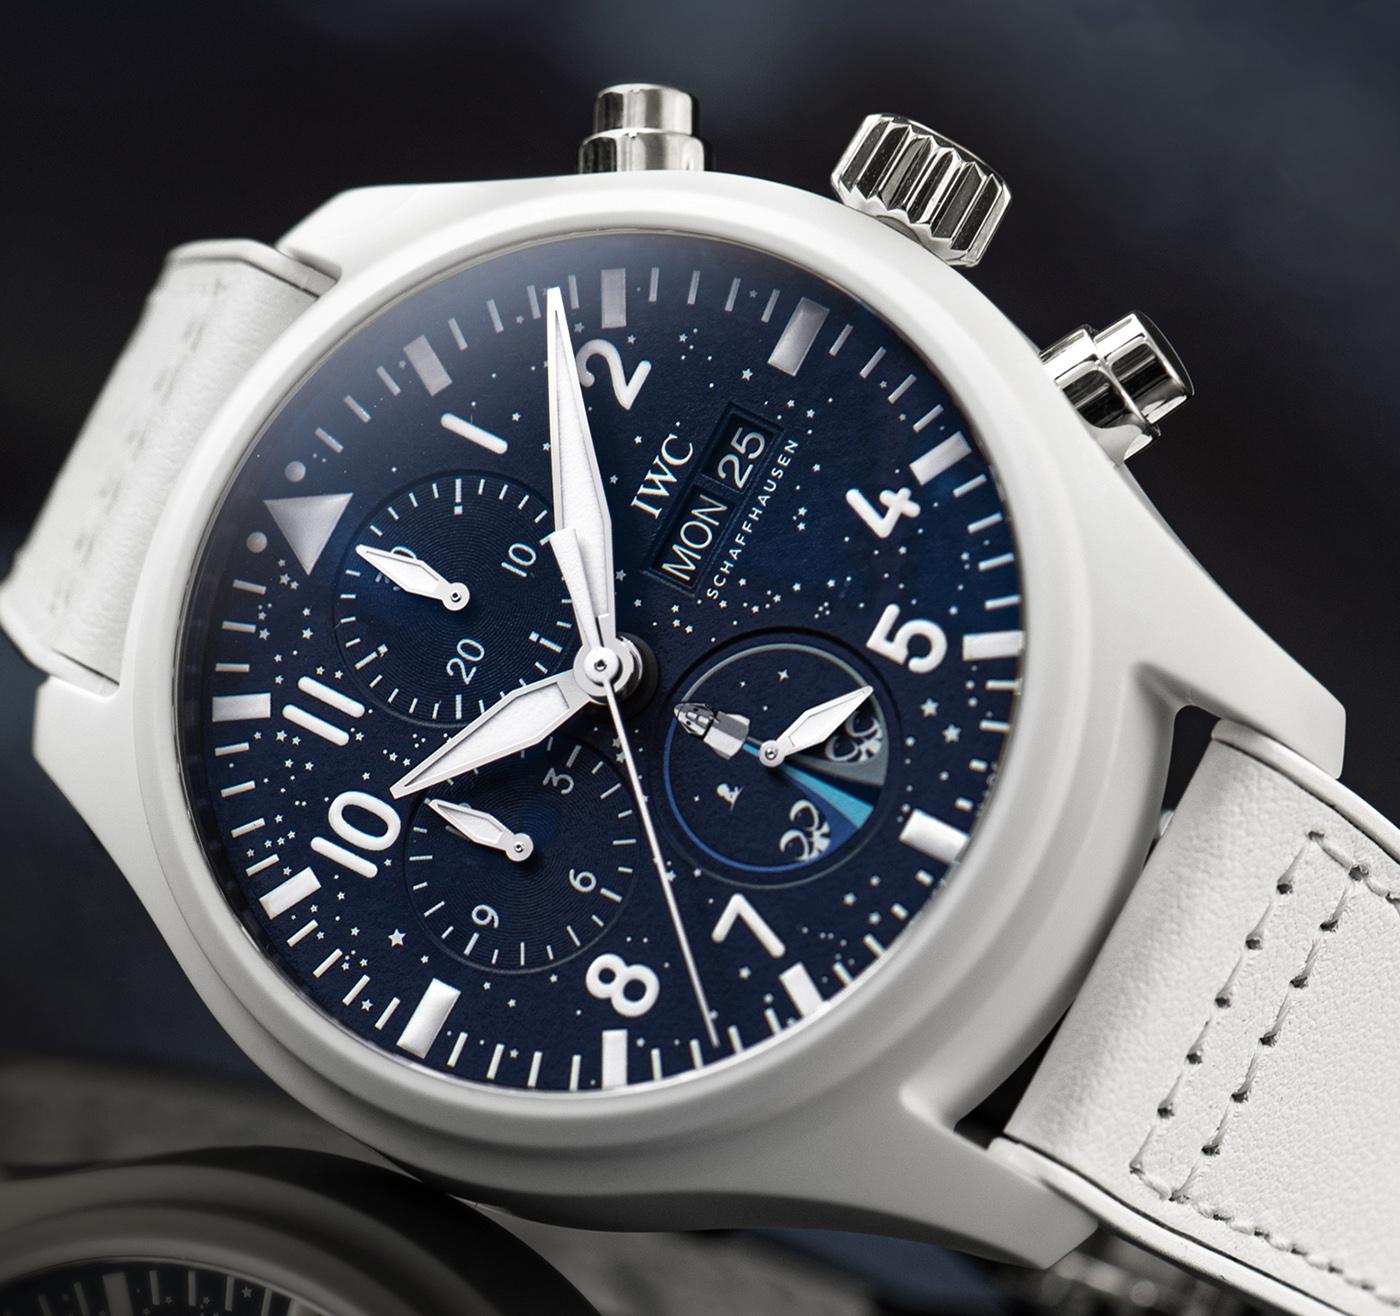 IWC Pilot's Watch Chronograph Inspiration4 Edition IW389110 Detalle